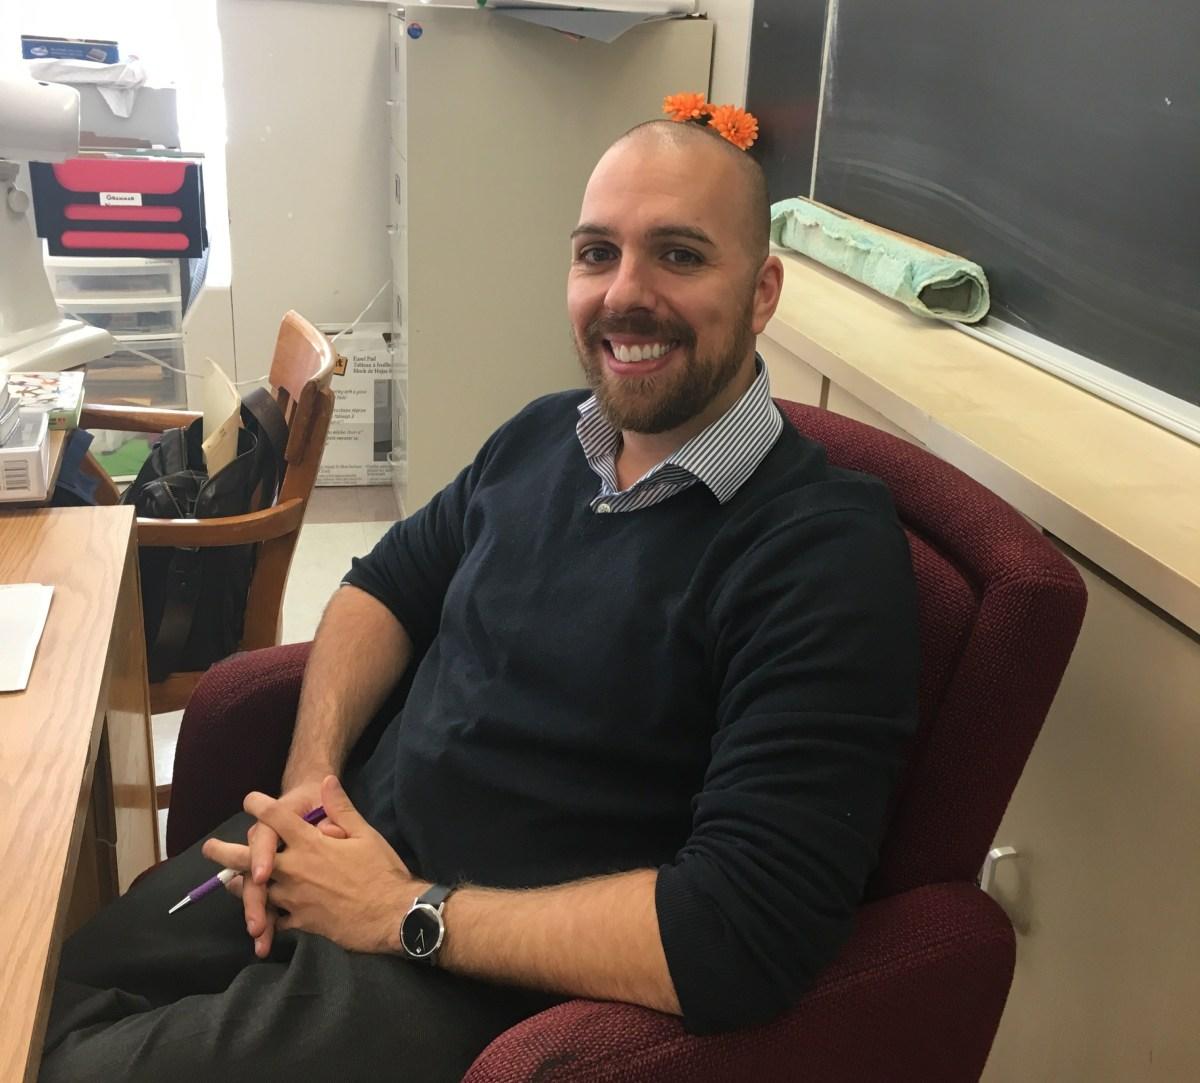 Humans of FHCI - Mr Ferroni